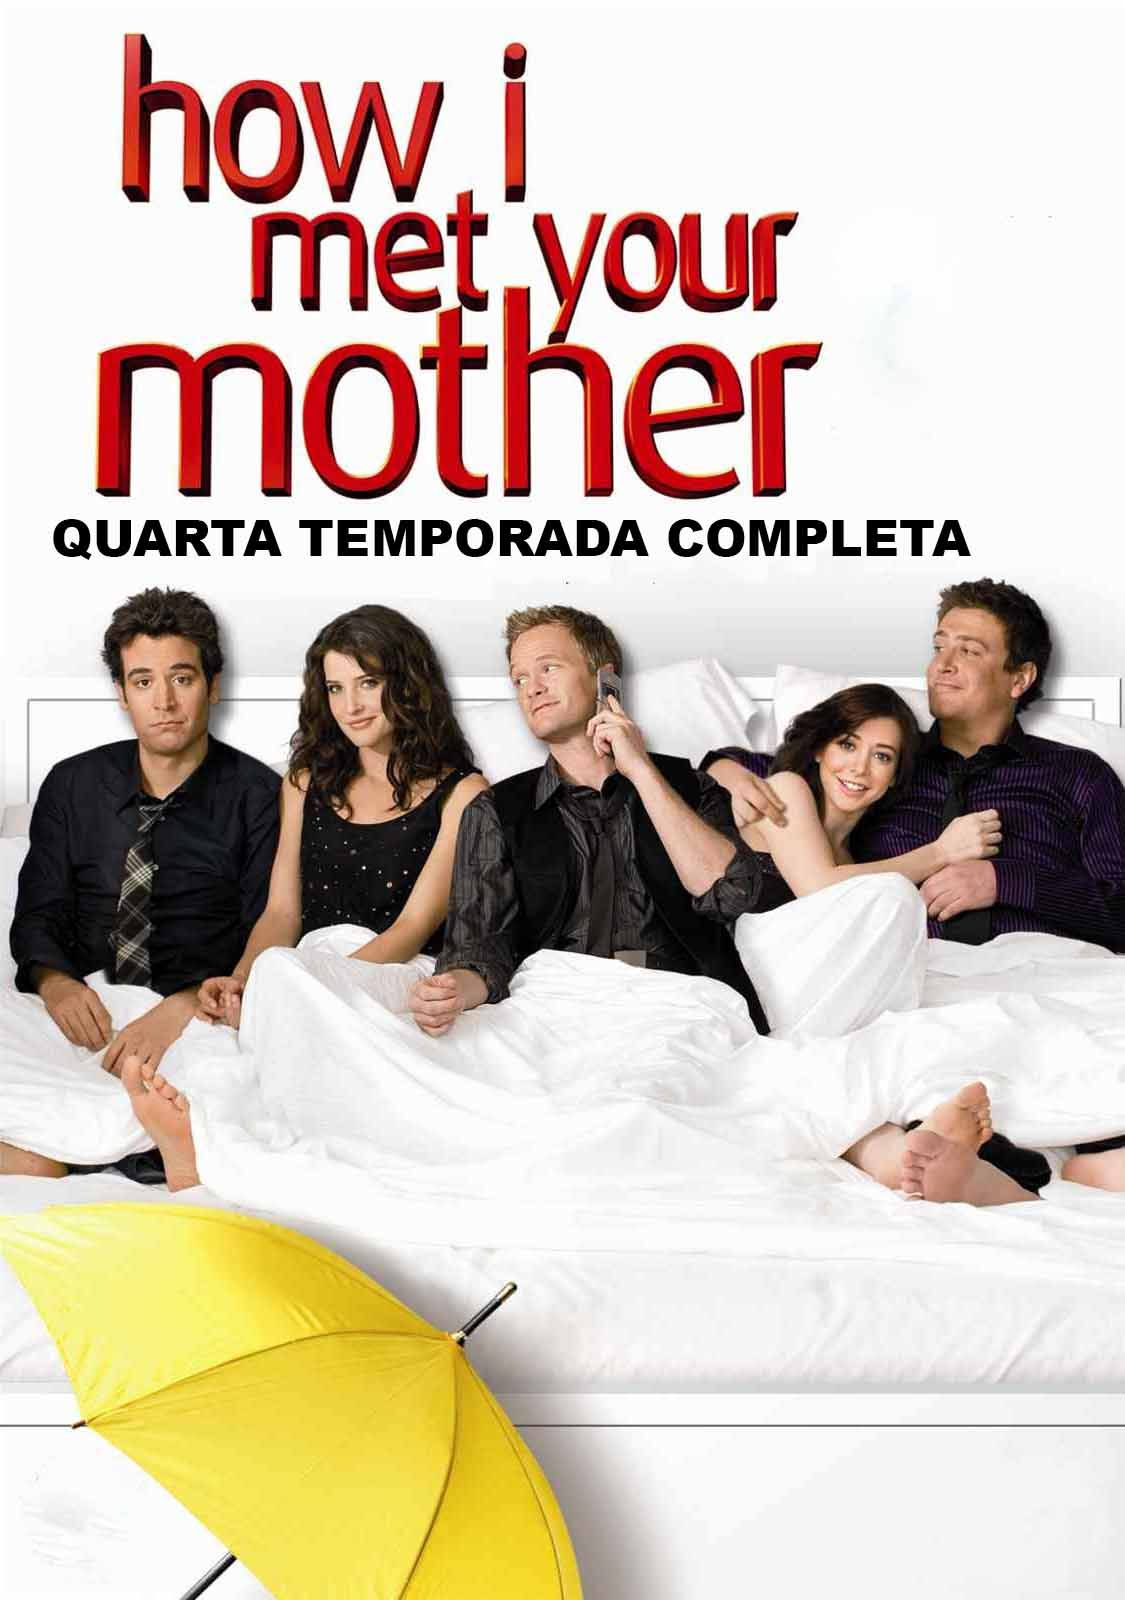 How I Met Your Mother 4ª Temporada Torrent – WEB-DL 720p Dual Áudio